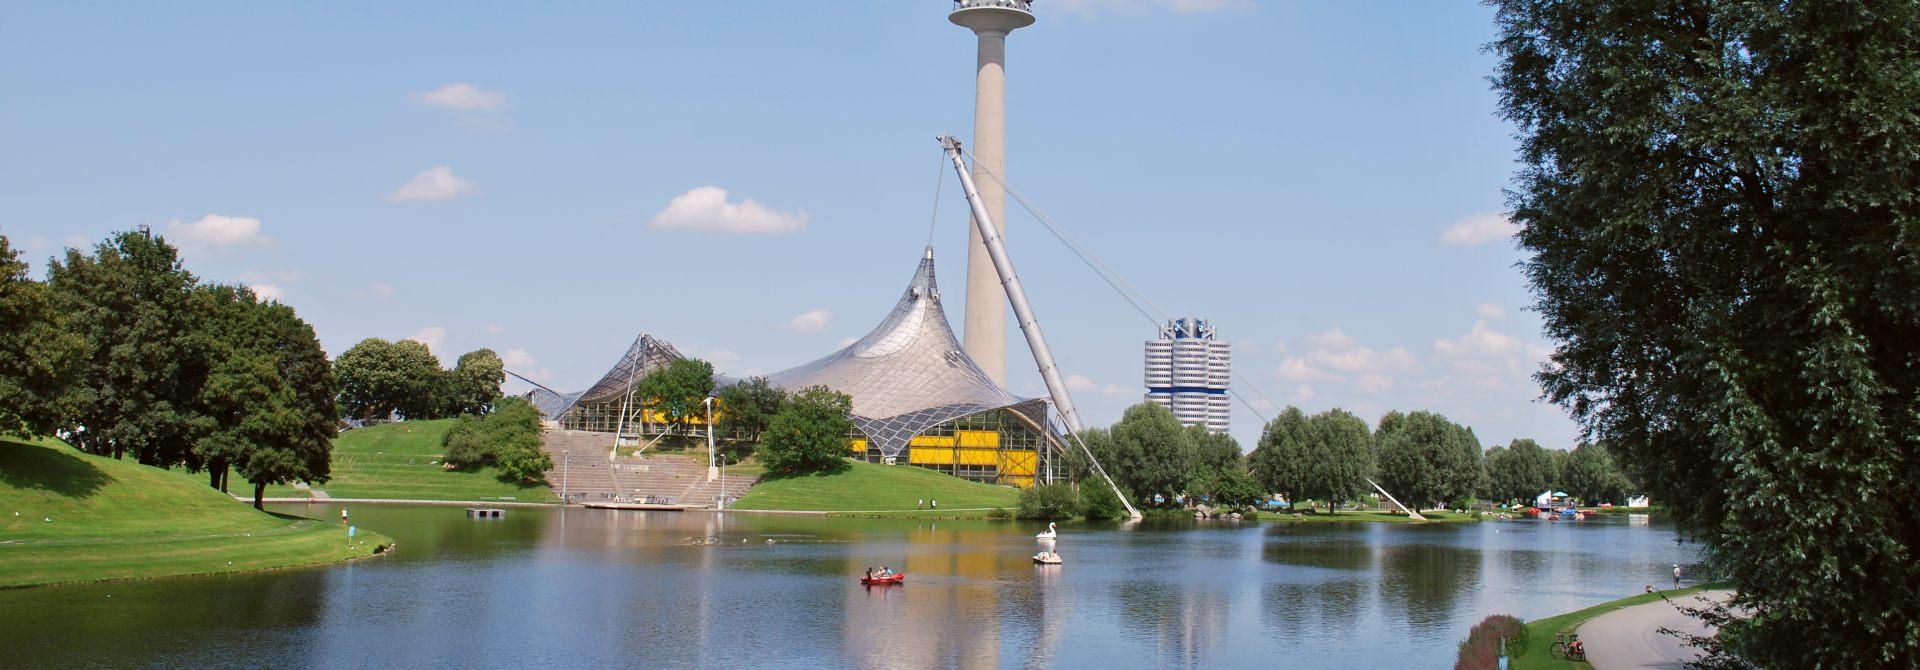 Munich Olympic Park Header